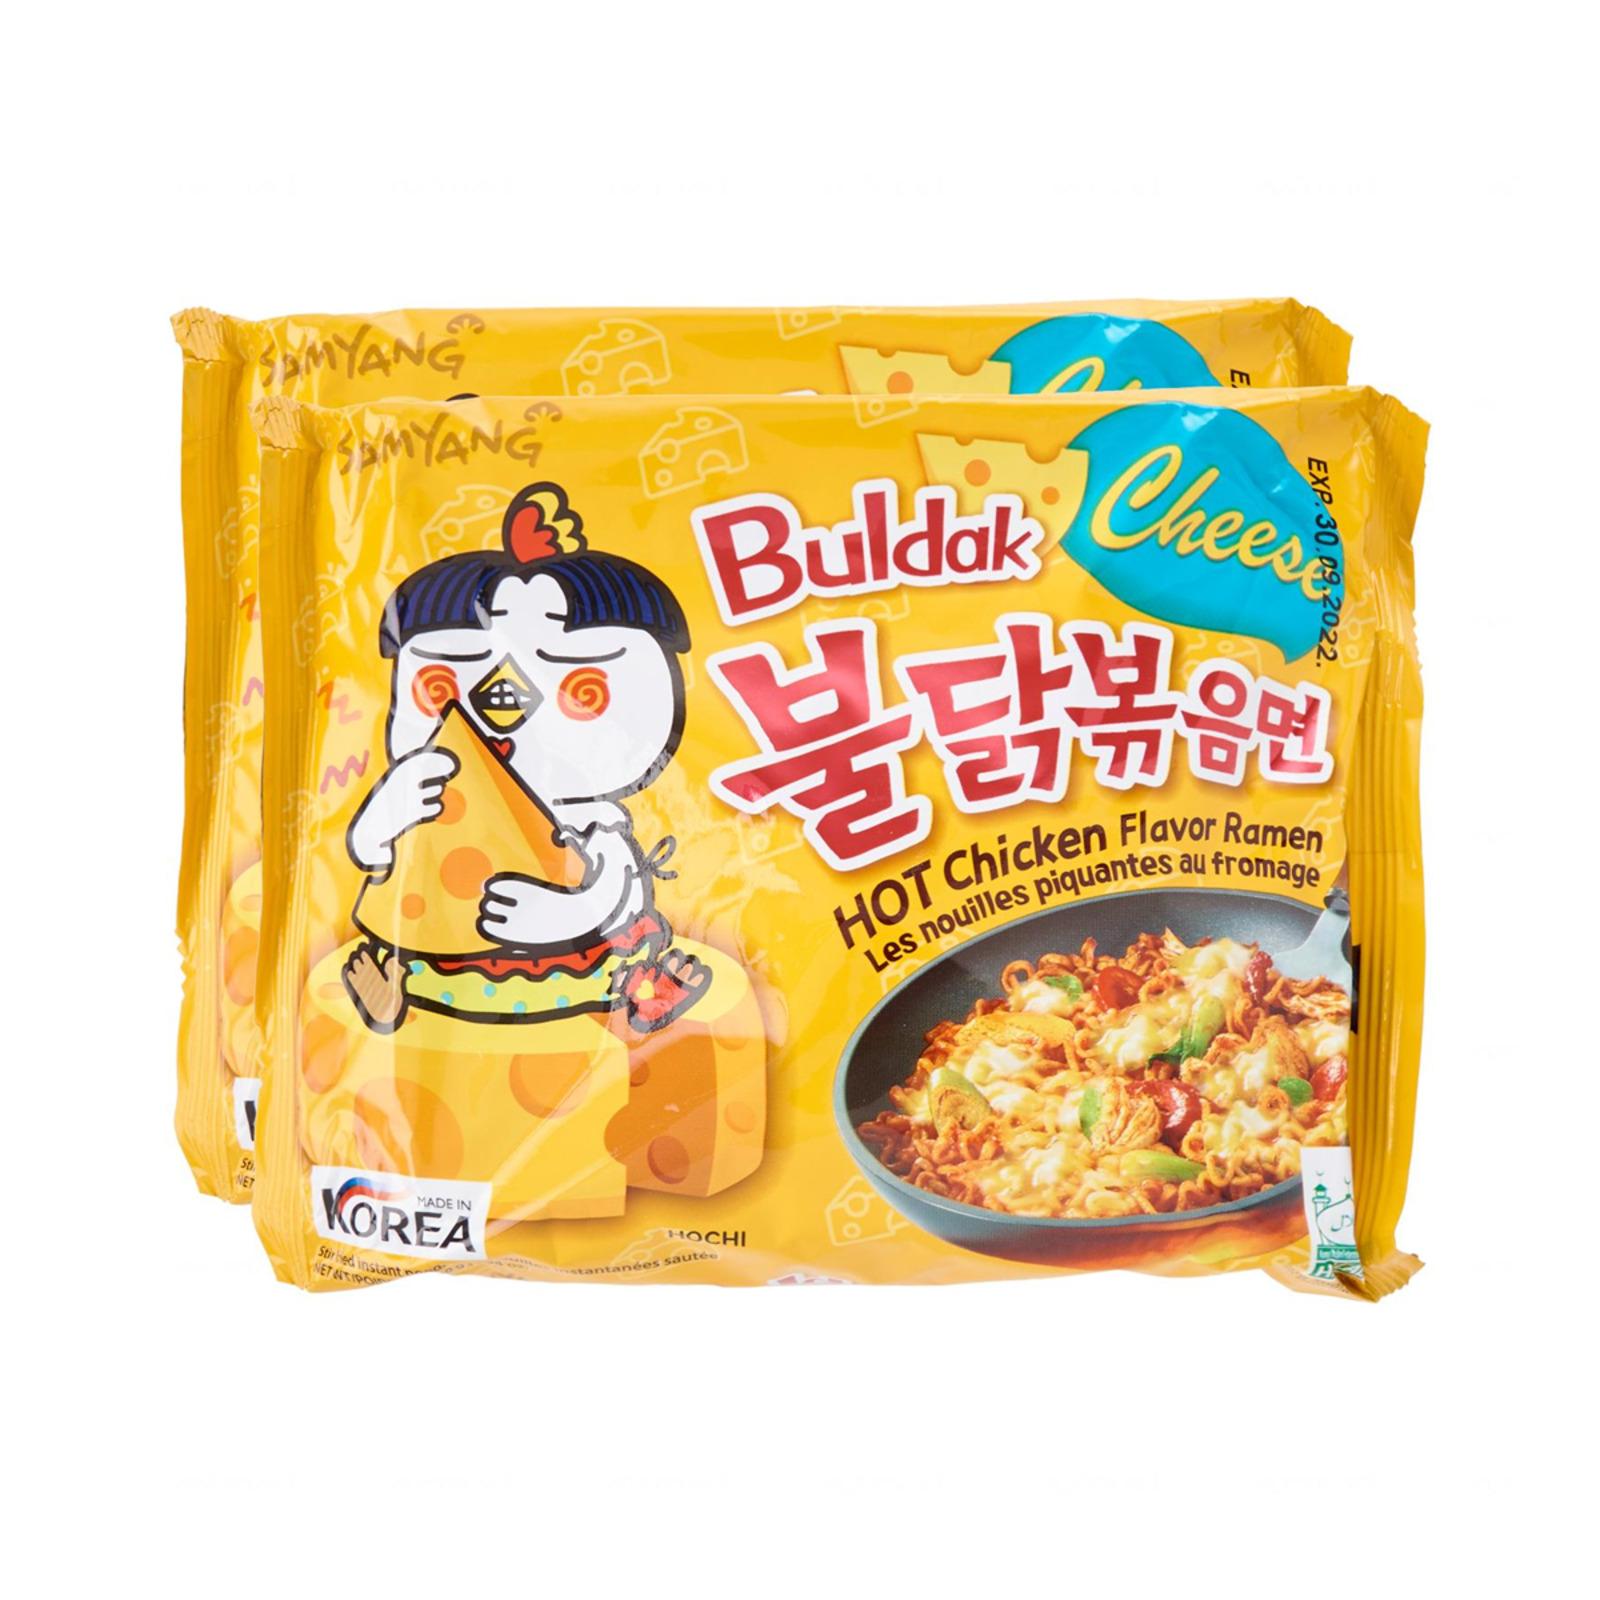 Samyang Hot Chicken Cheese Ramen Single Packet